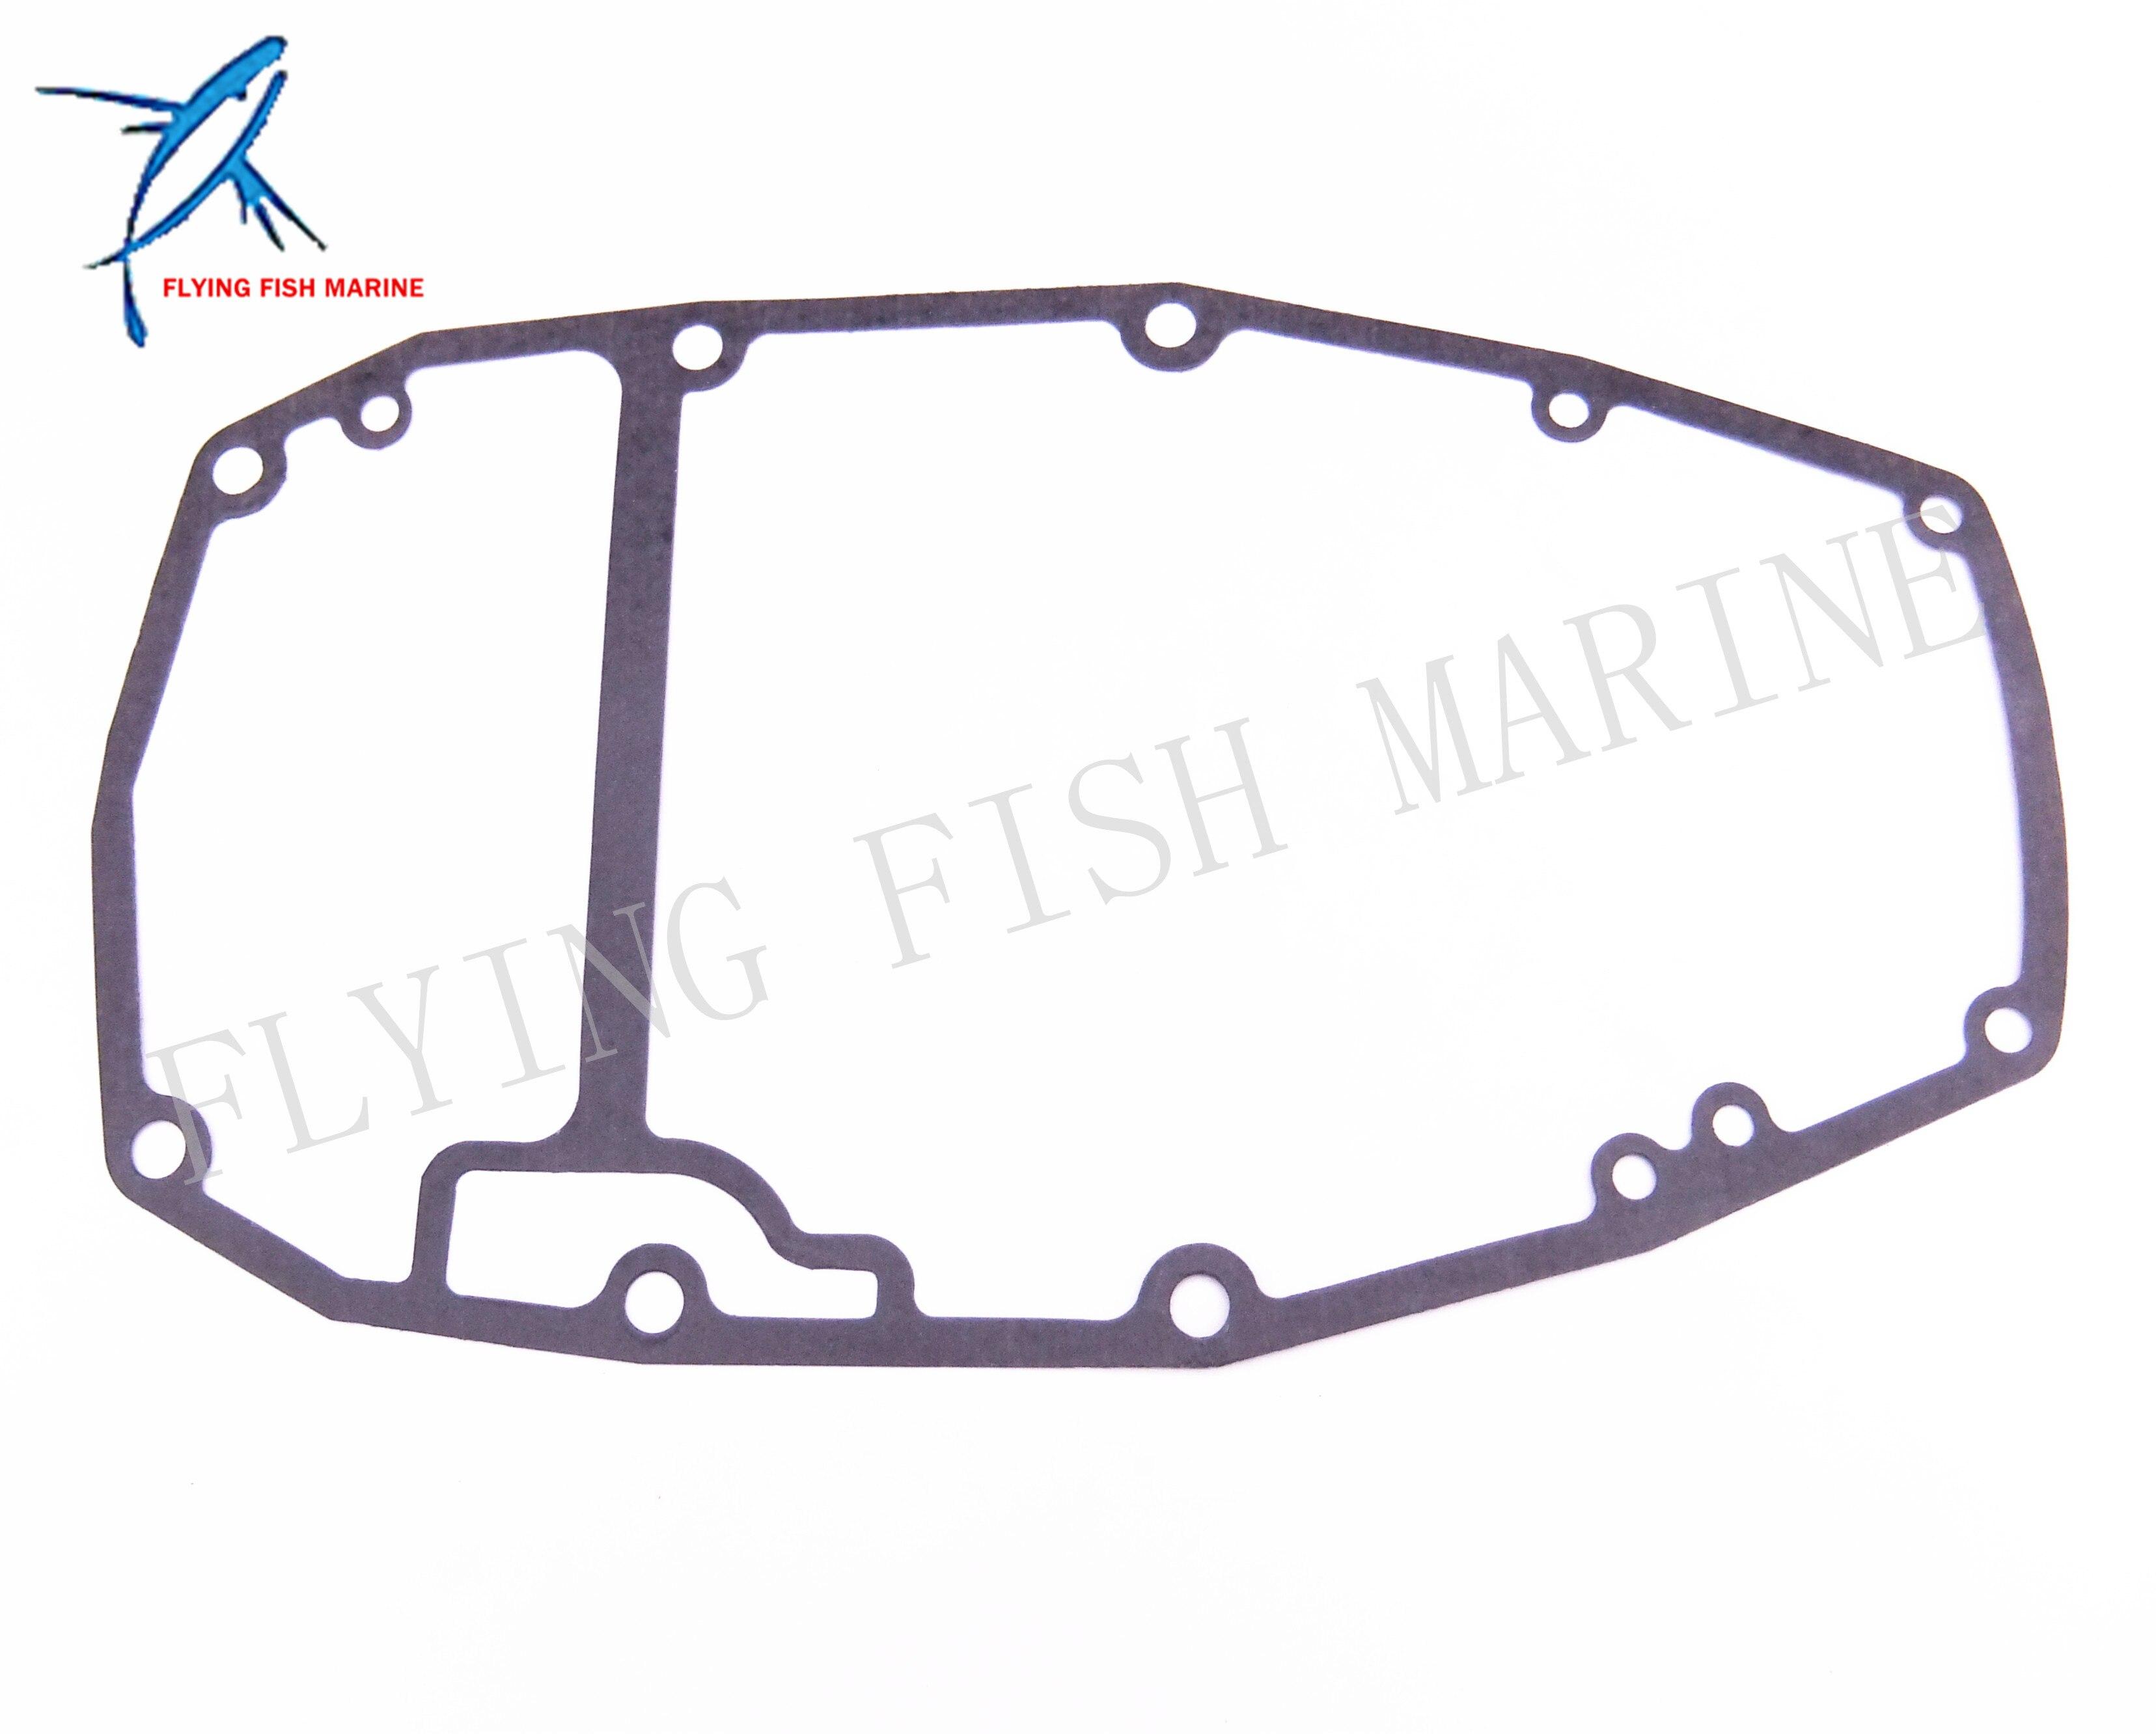 Motor fueraborda 66M-45113-00 Junta Superior para Yamaha F15 F9.9 T9.9 Motor de barco envío gratis